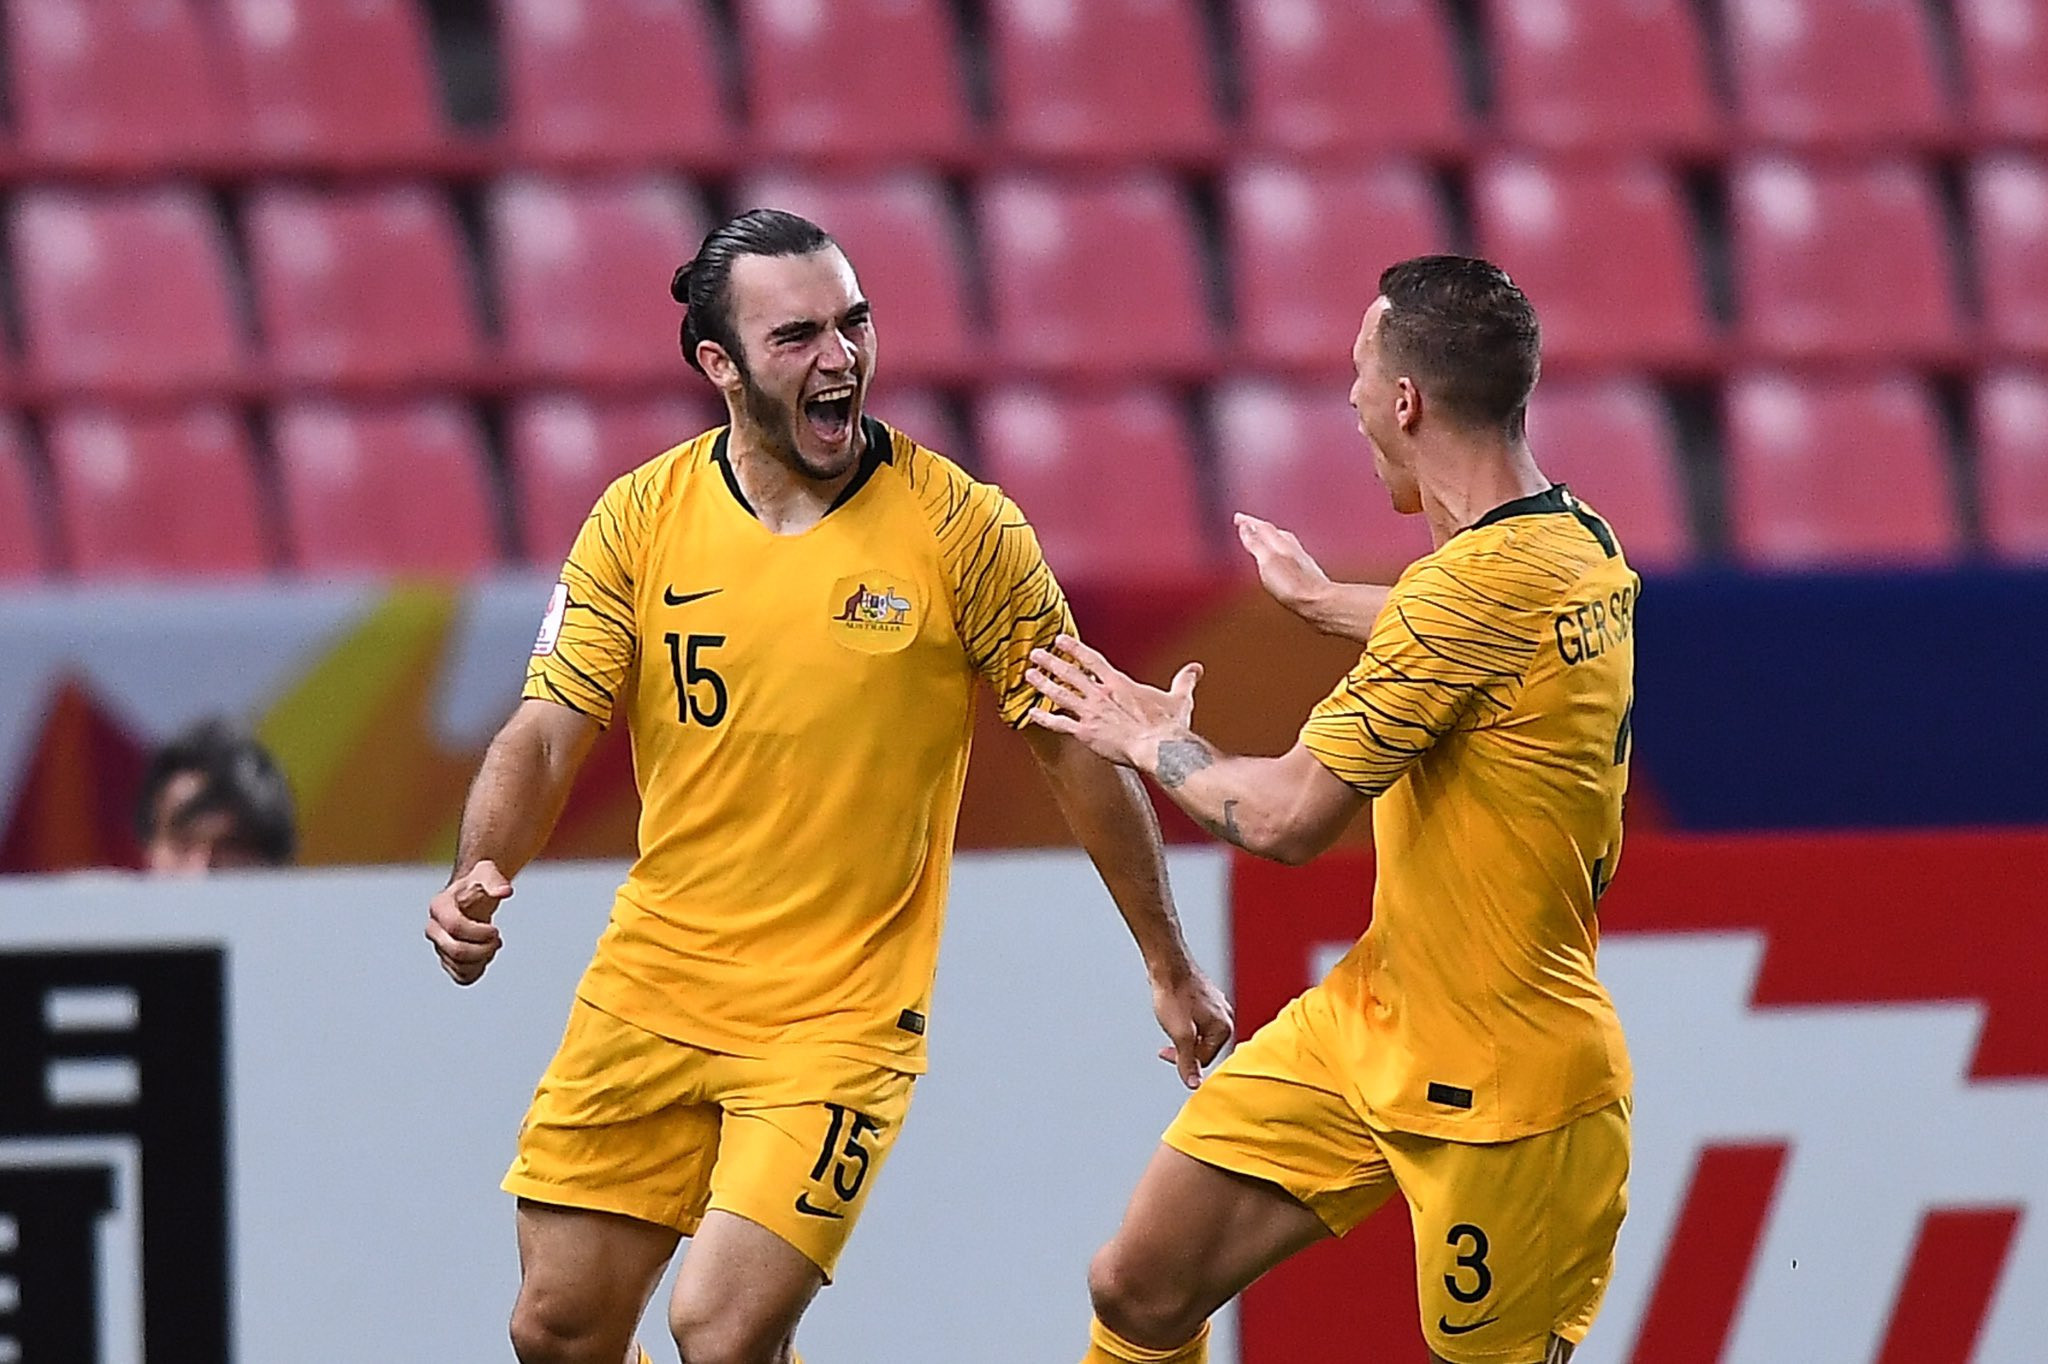 Australia qualify for Olympic men's football tournament at Tokyo 2020